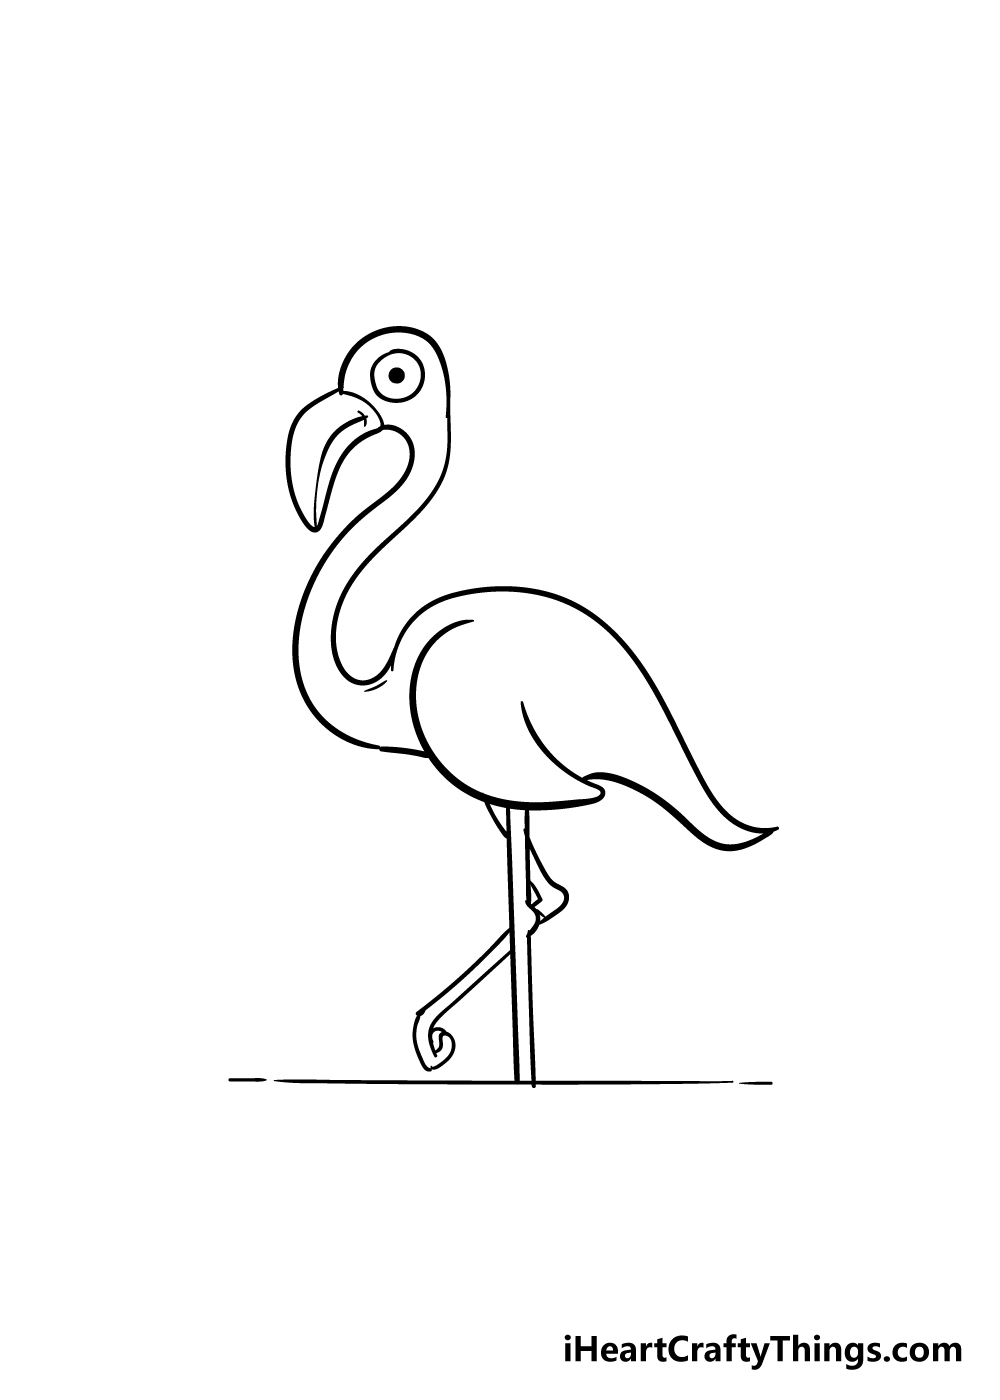 flamingo drawing step 7